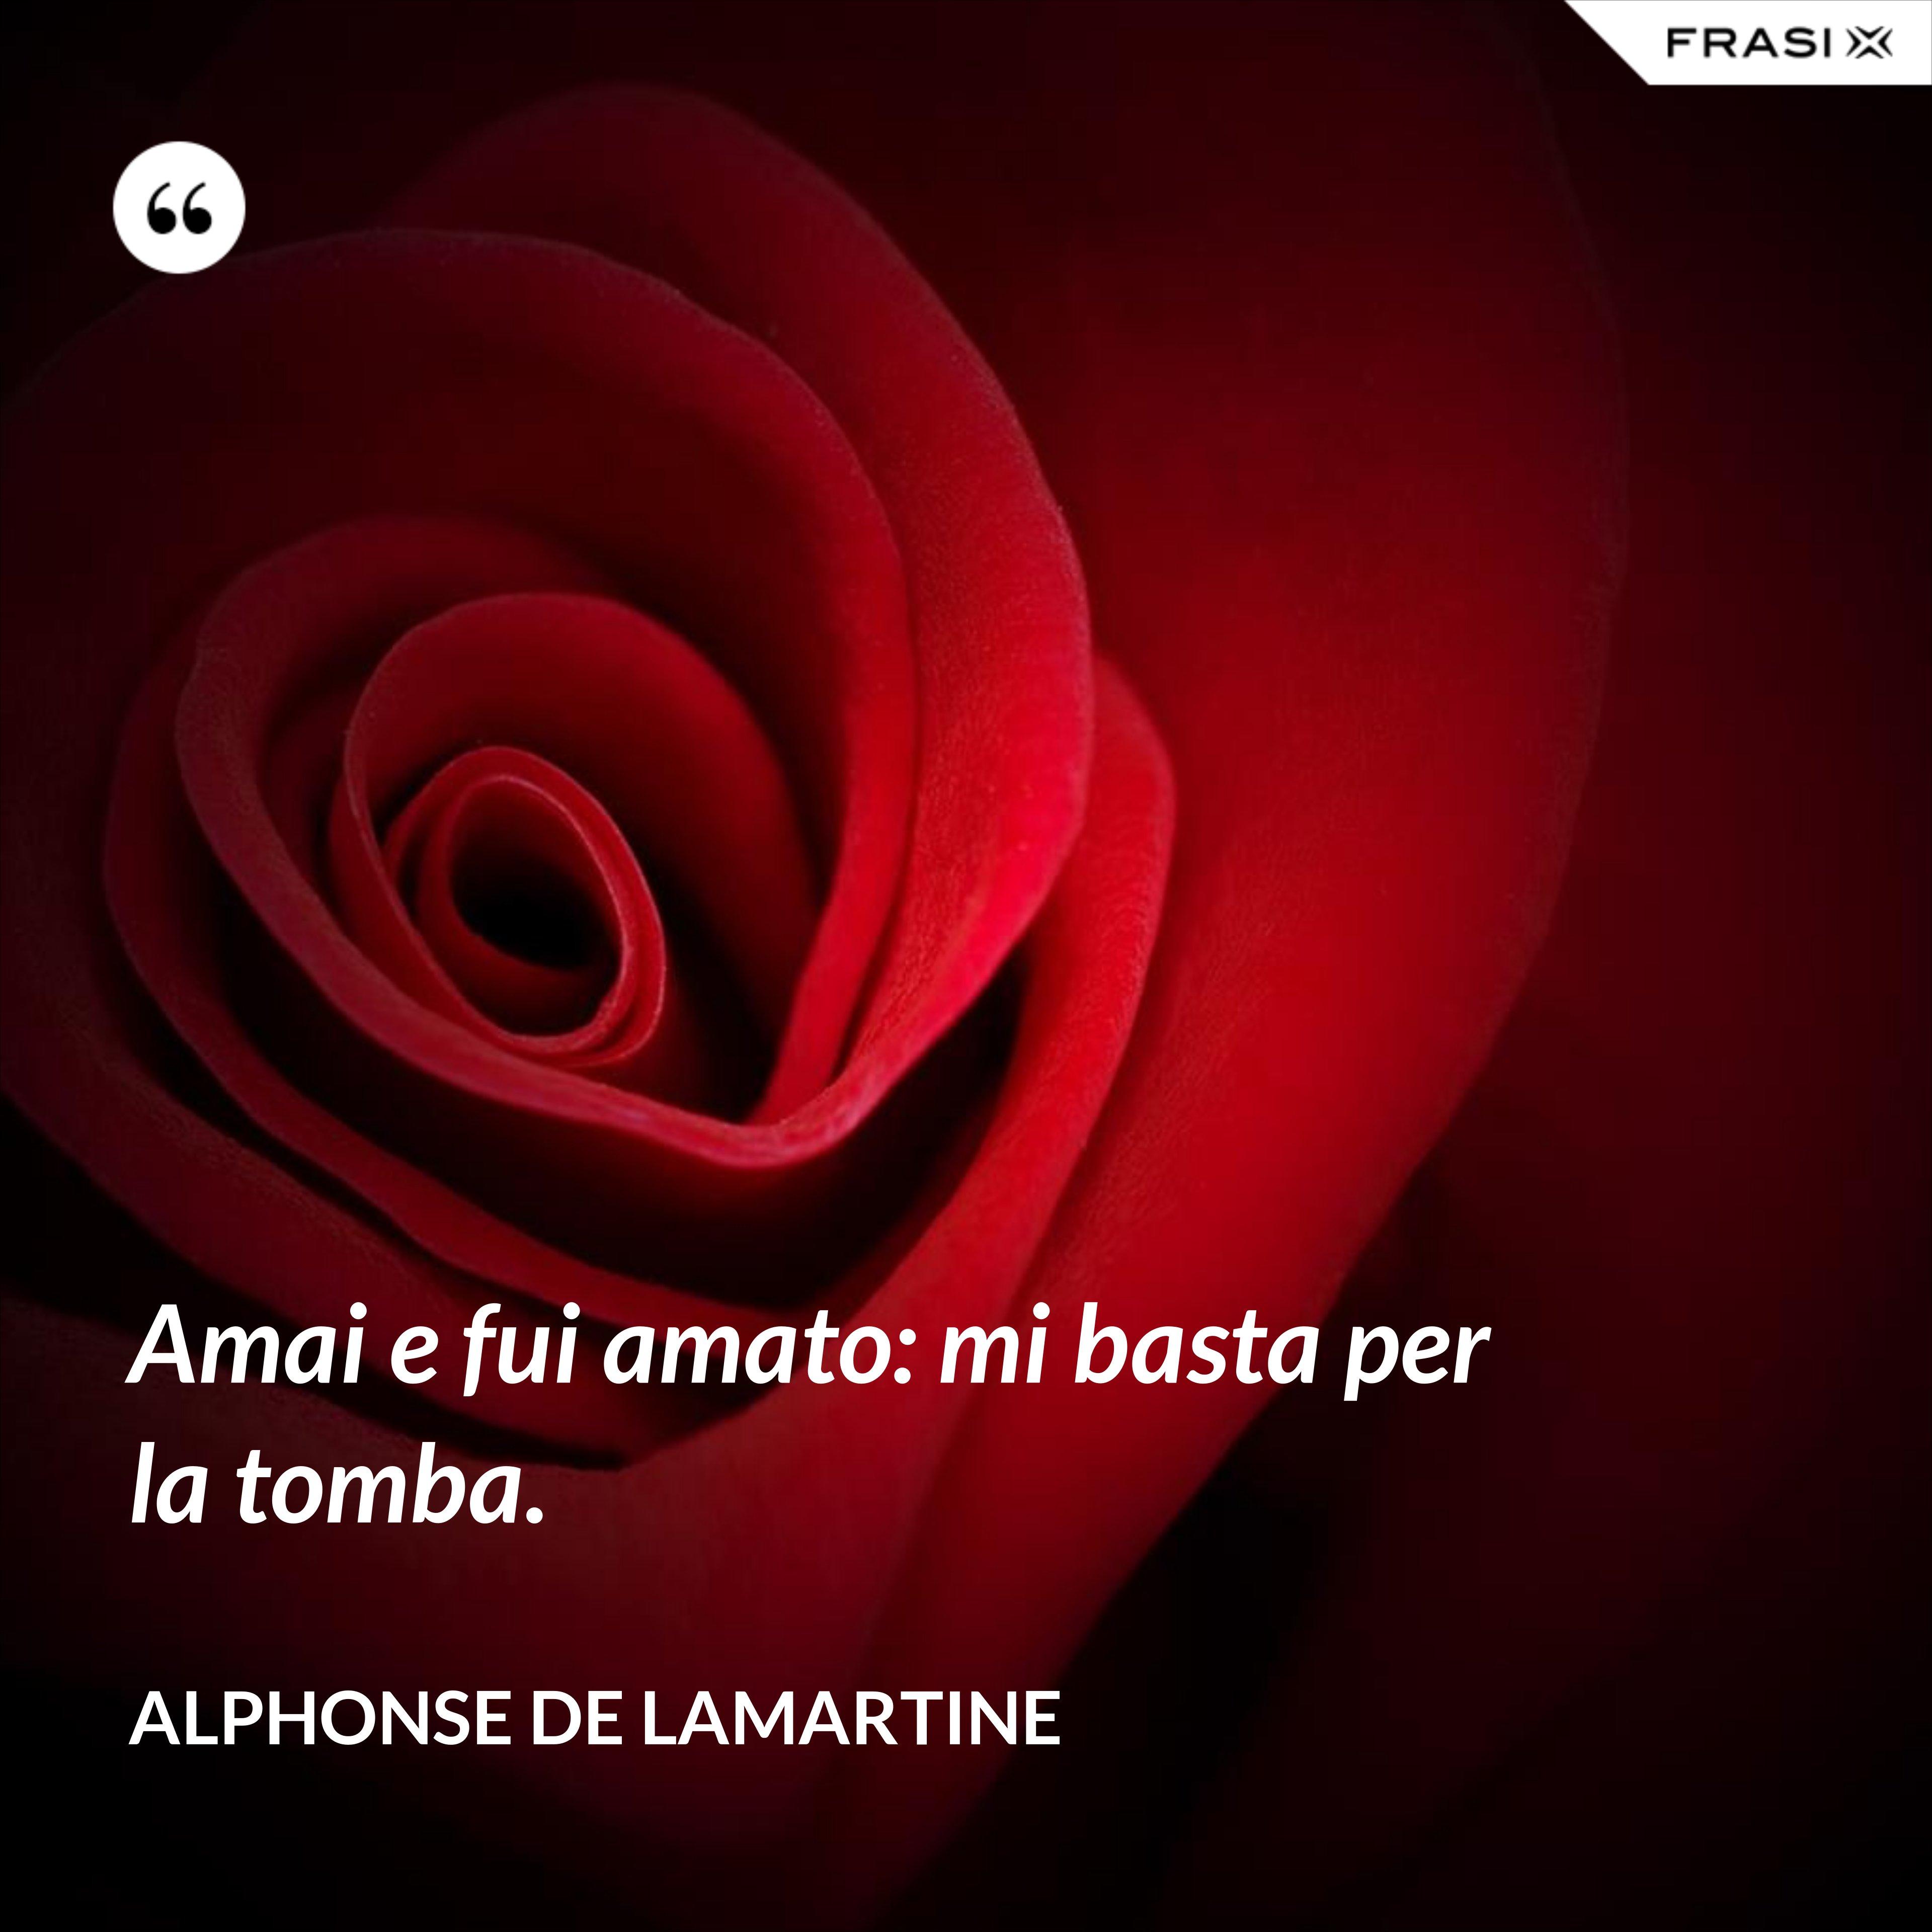 Amai e fui amato: mi basta per la tomba. - Alphonse de Lamartine